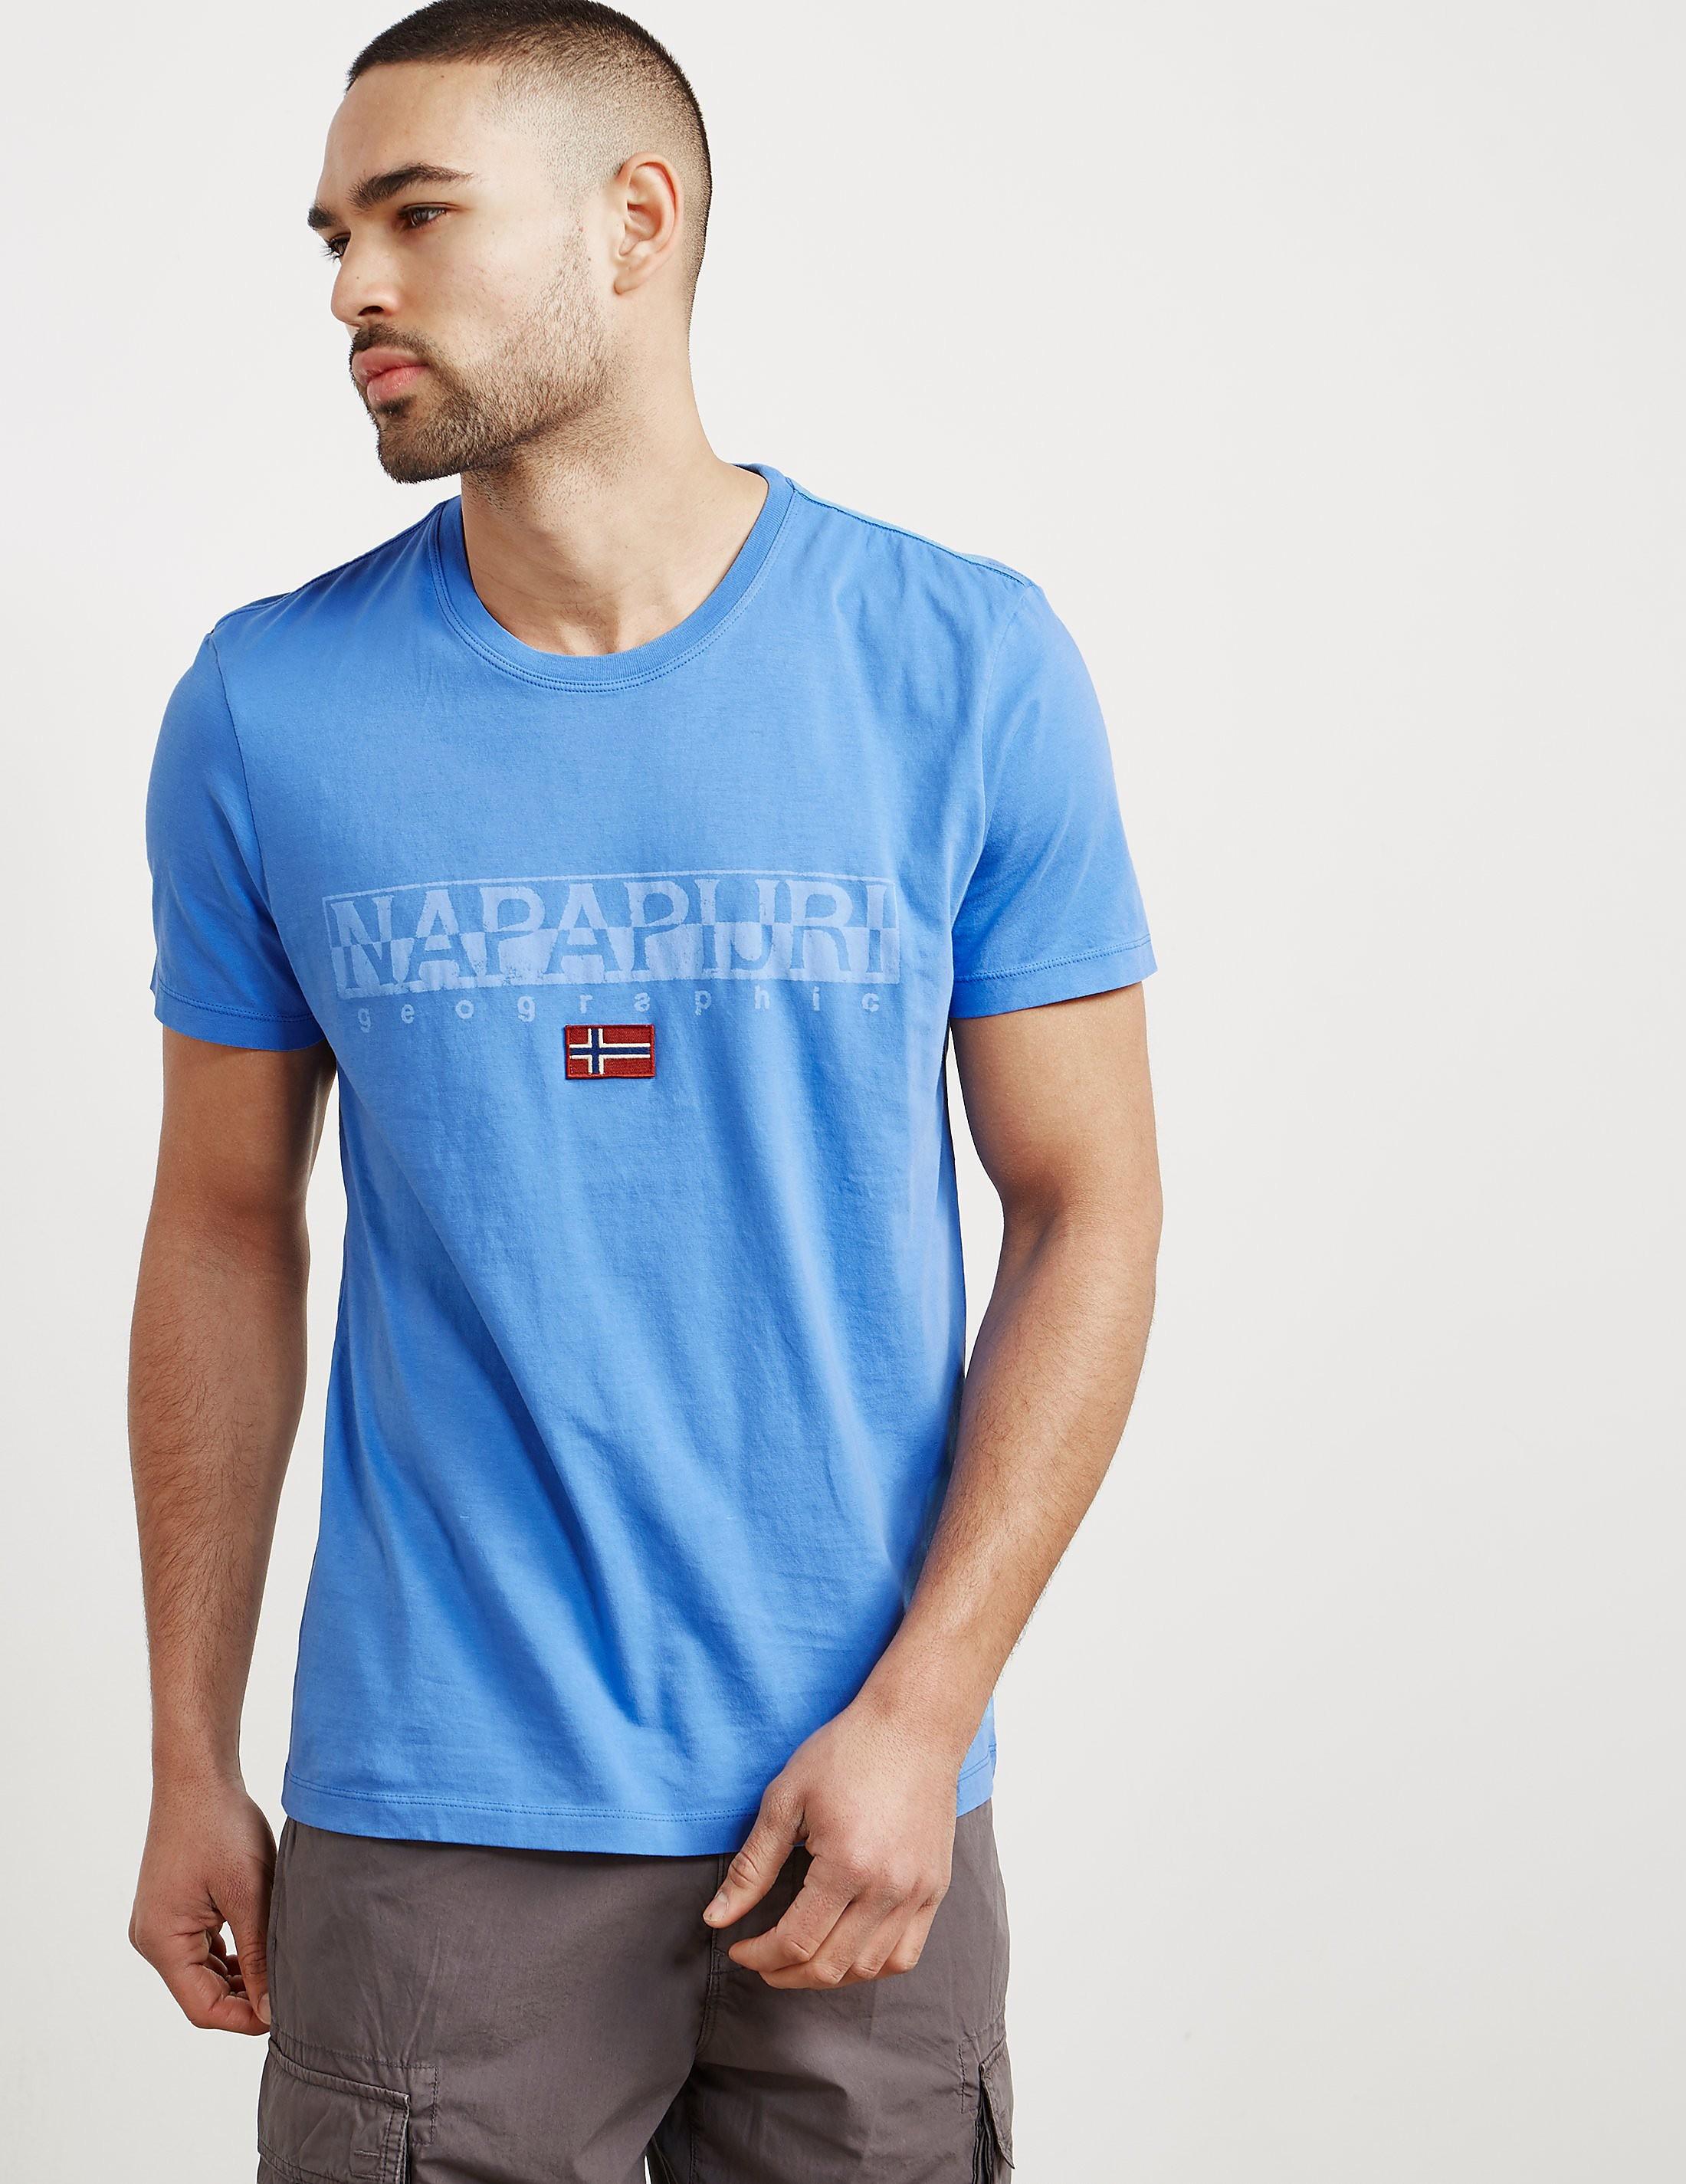 Napapijri Sapriol Core Short Sleeve T-Shirt